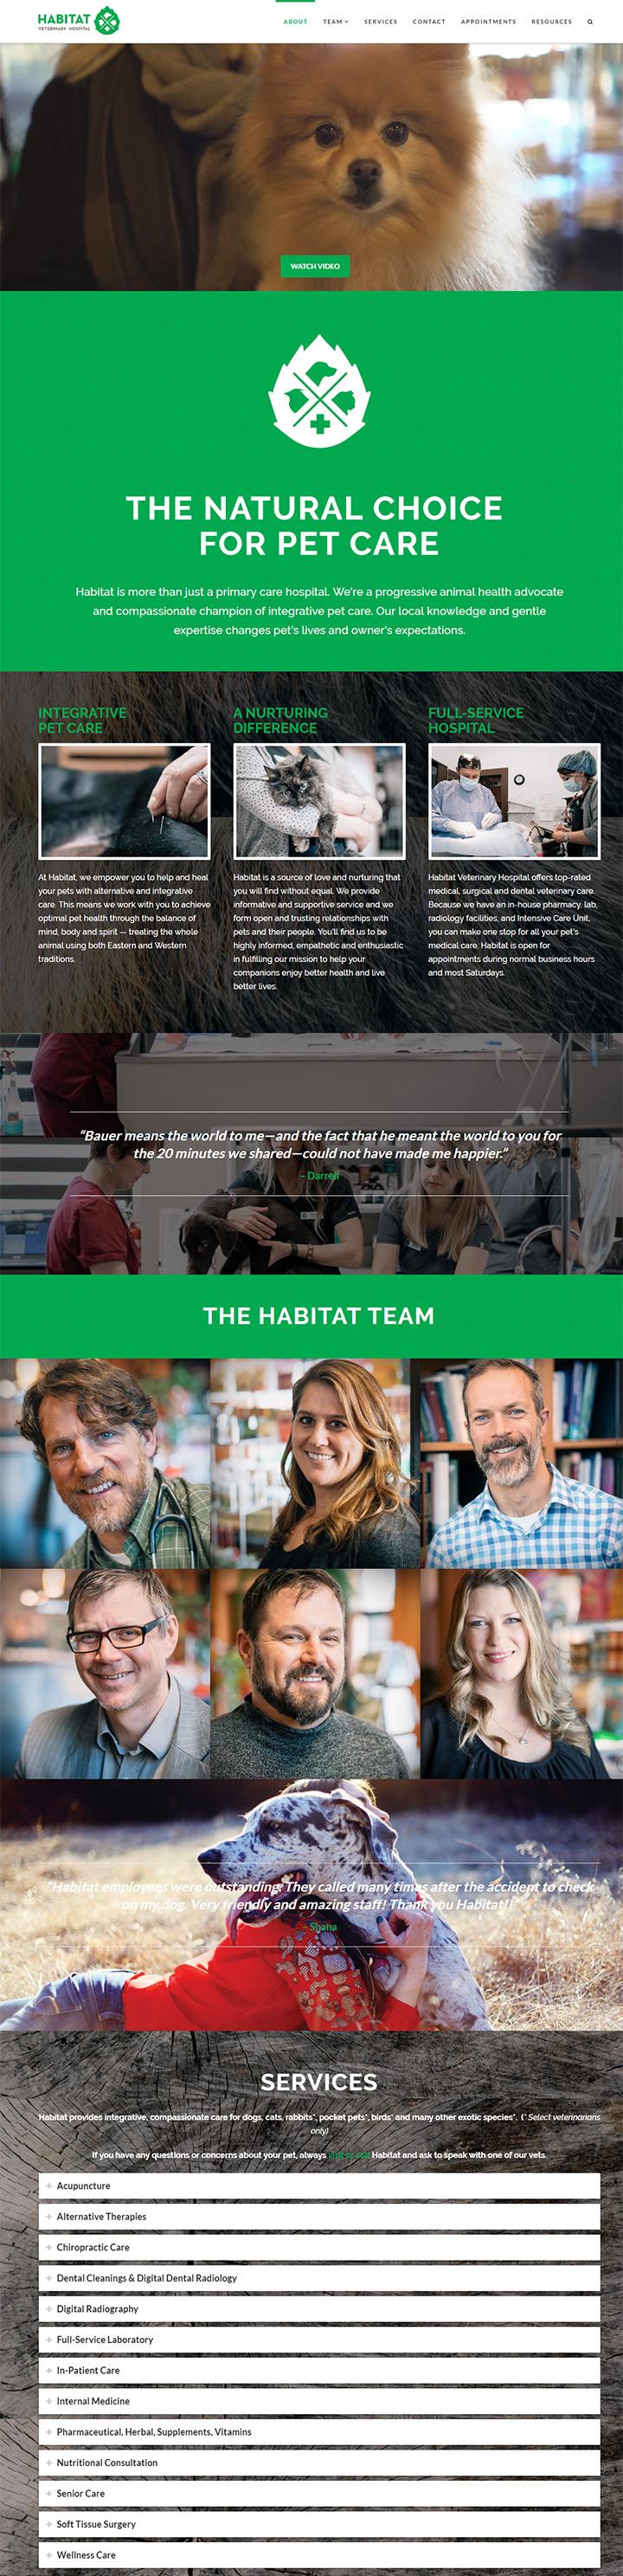 habitat vet hospital